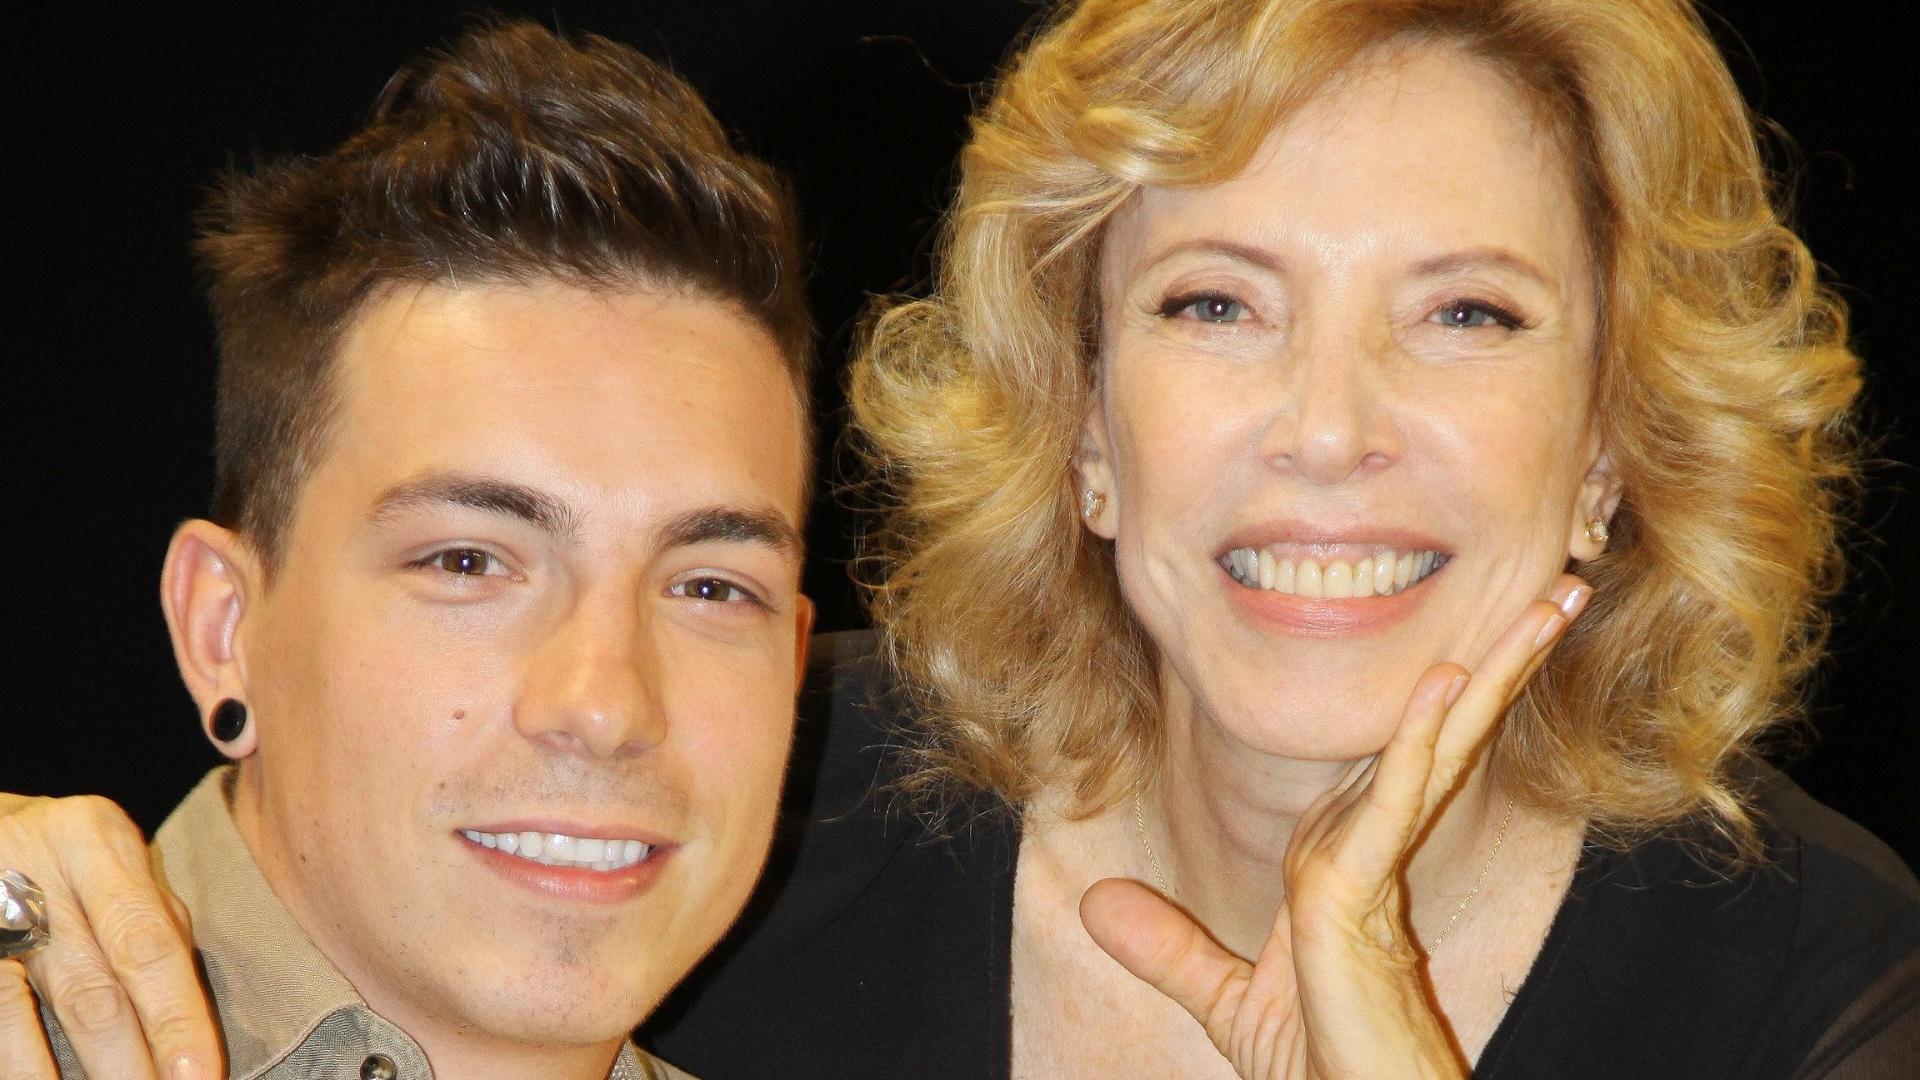 9.dez.2012 - Marília Gabriela entrevista Di Ferrero, vocalista do NX Zero, no